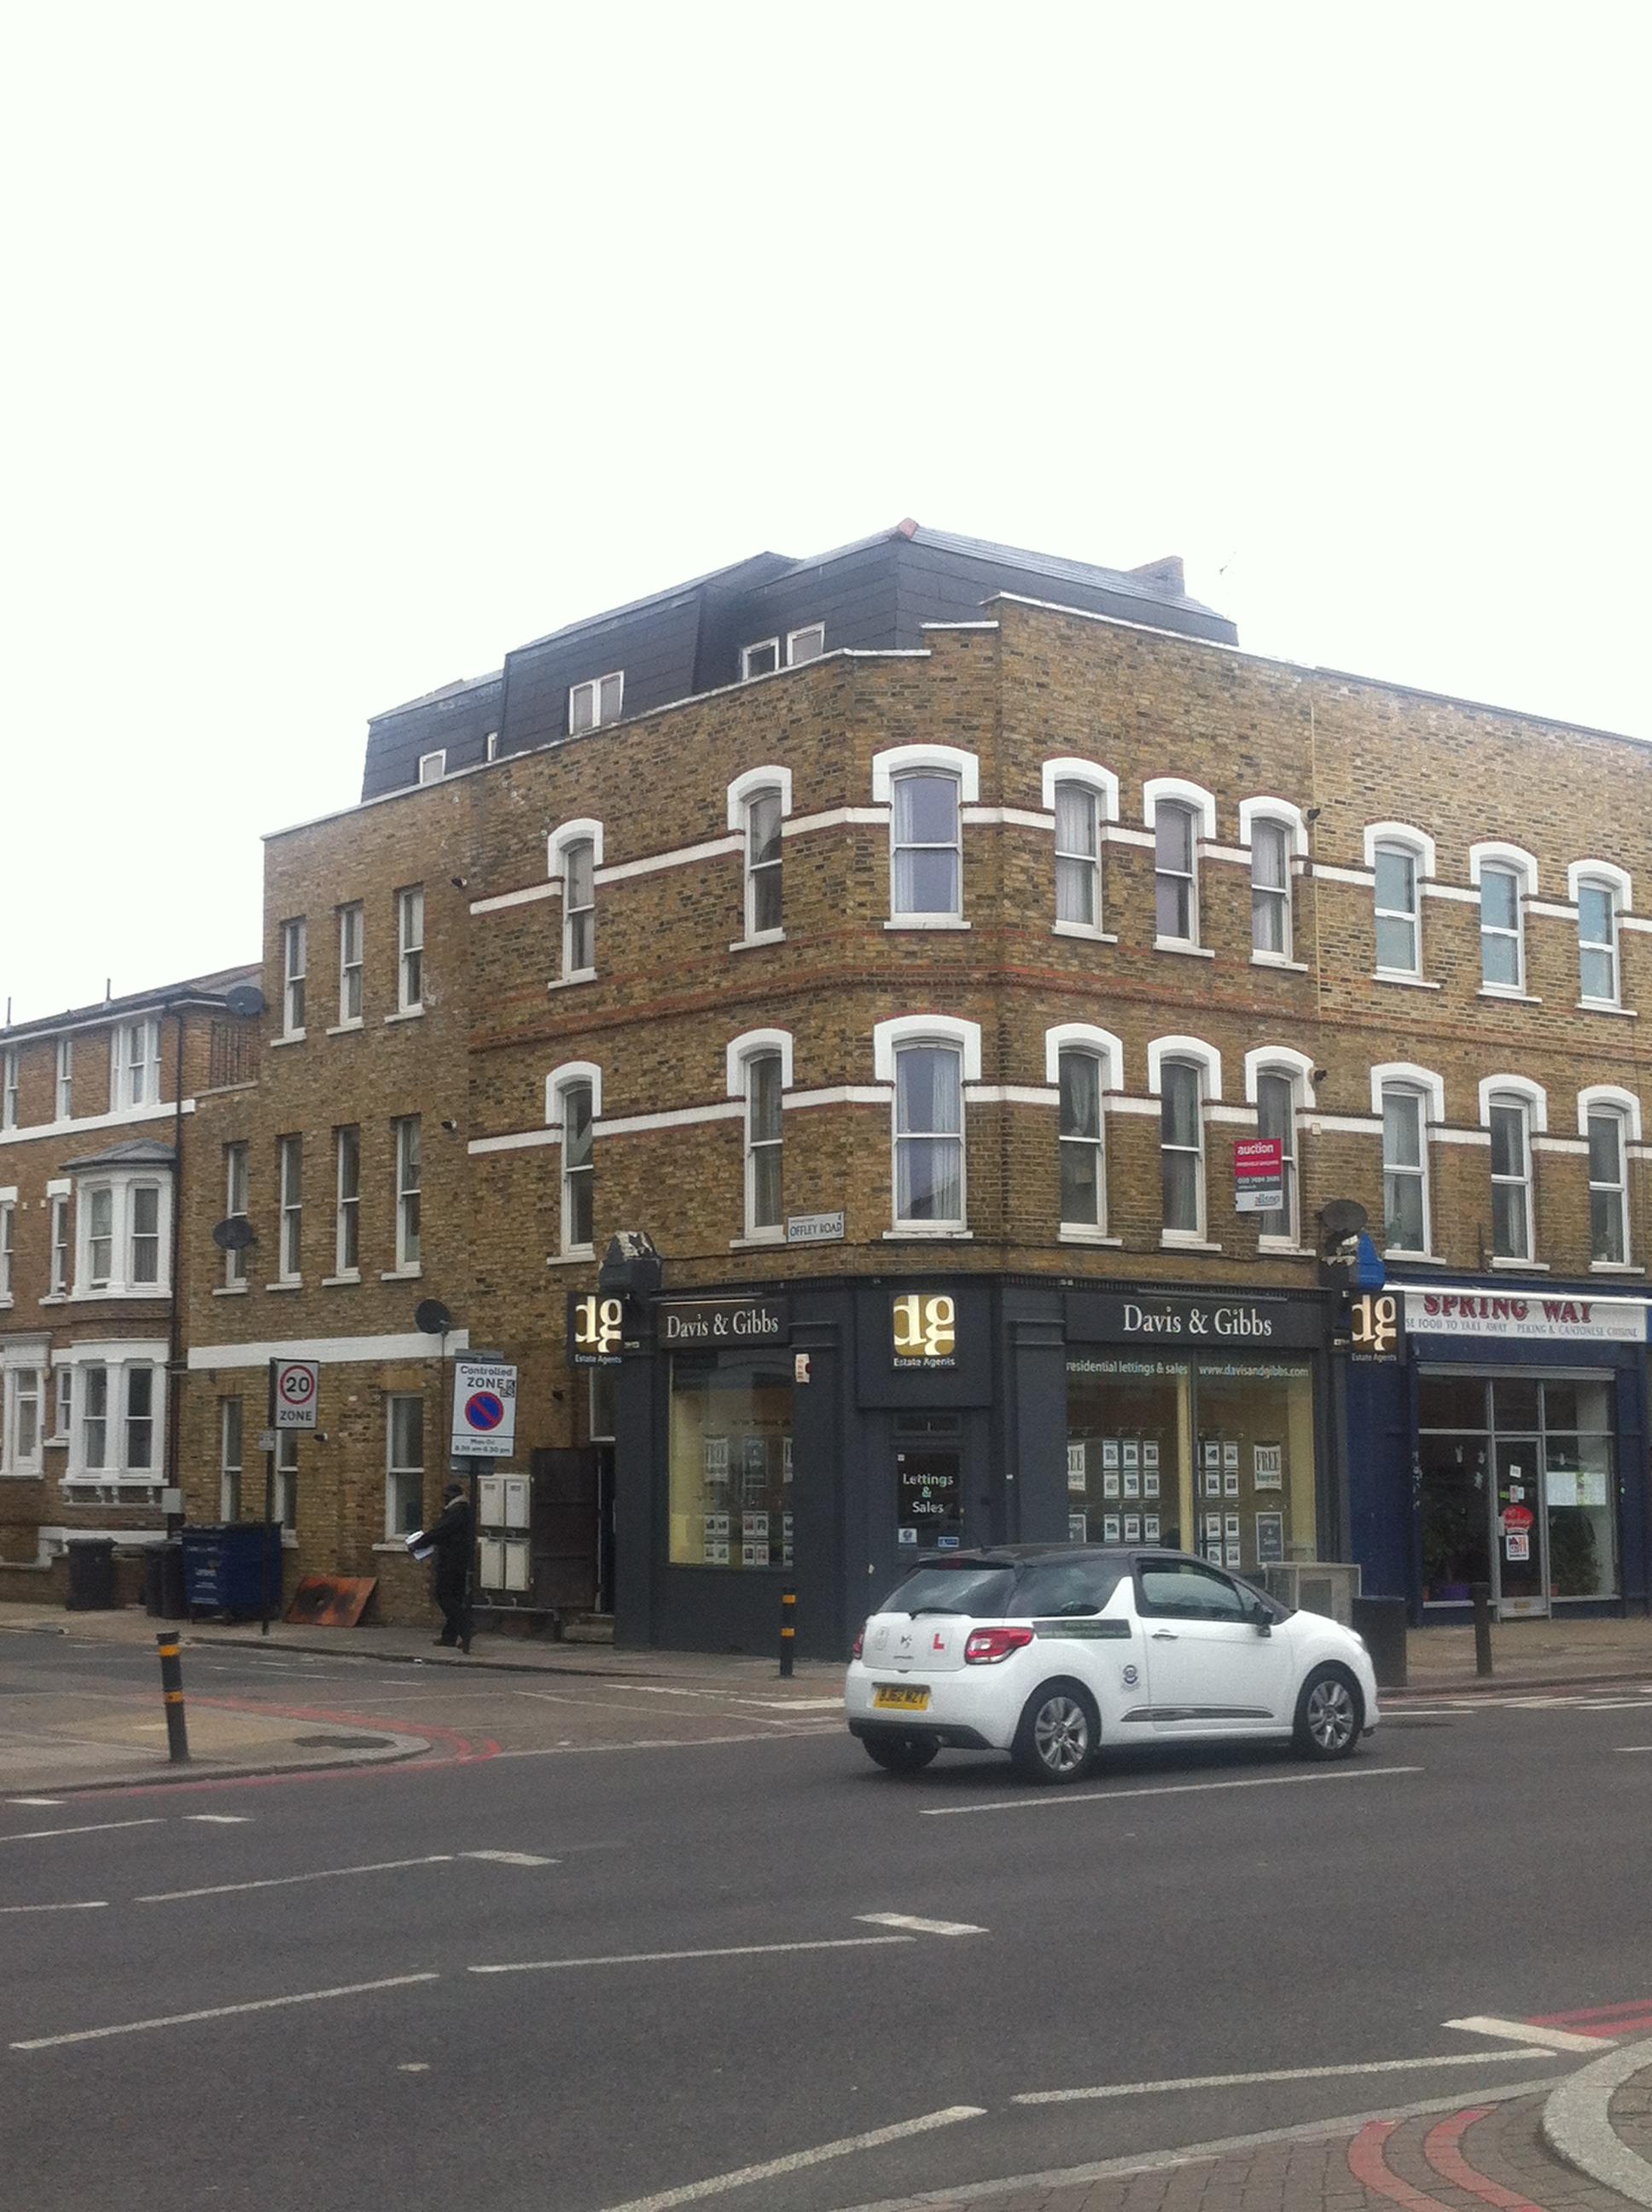 36 Brixton Road, SW9